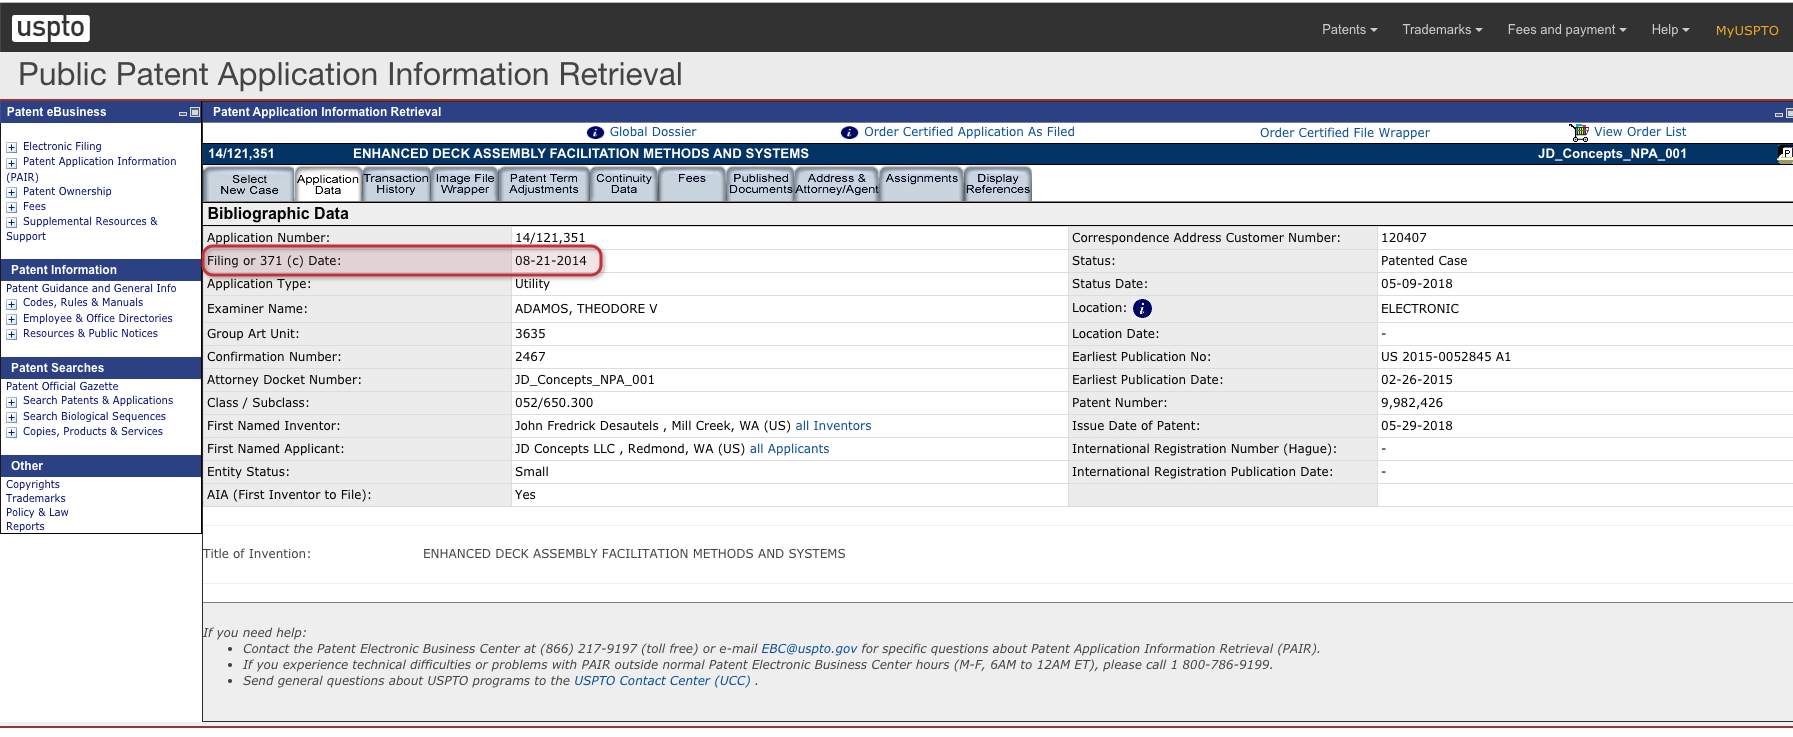 Public Patent Application Information Retrieval on USPTO